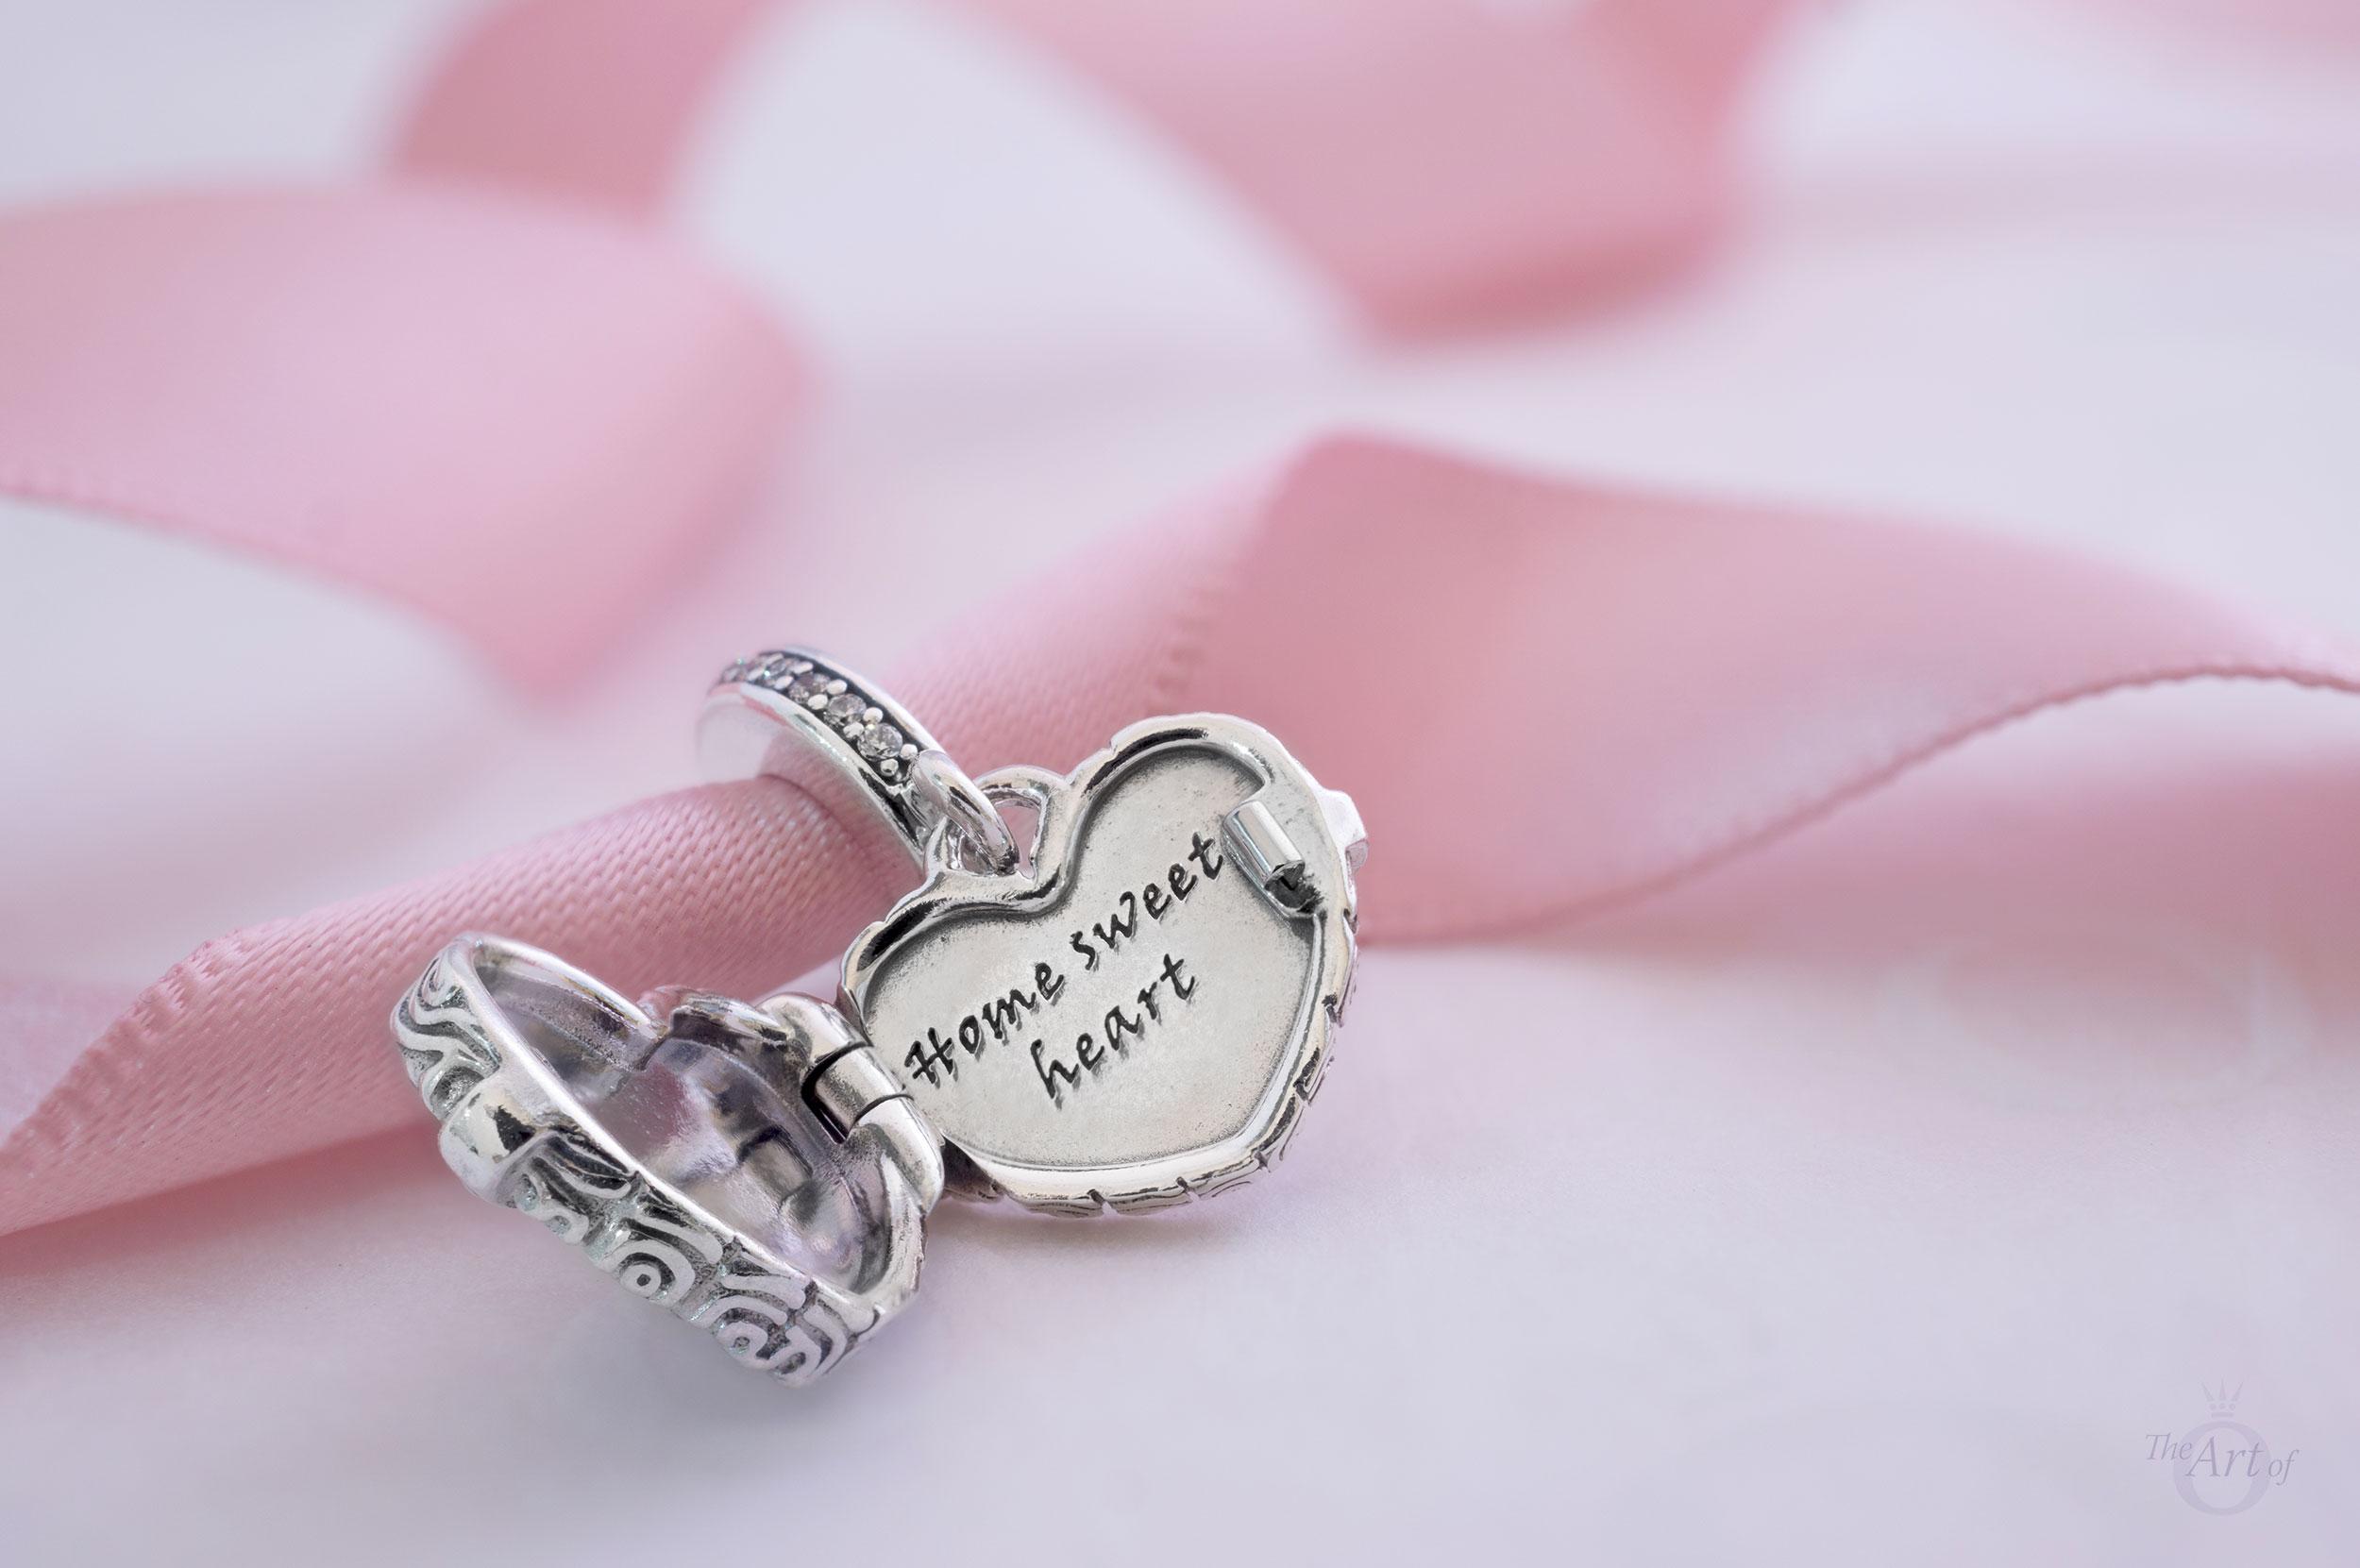 798284cz Pandora Home Sweet Heart Charm 4 The Art Of Pandora More Than Just A Pandora Blog